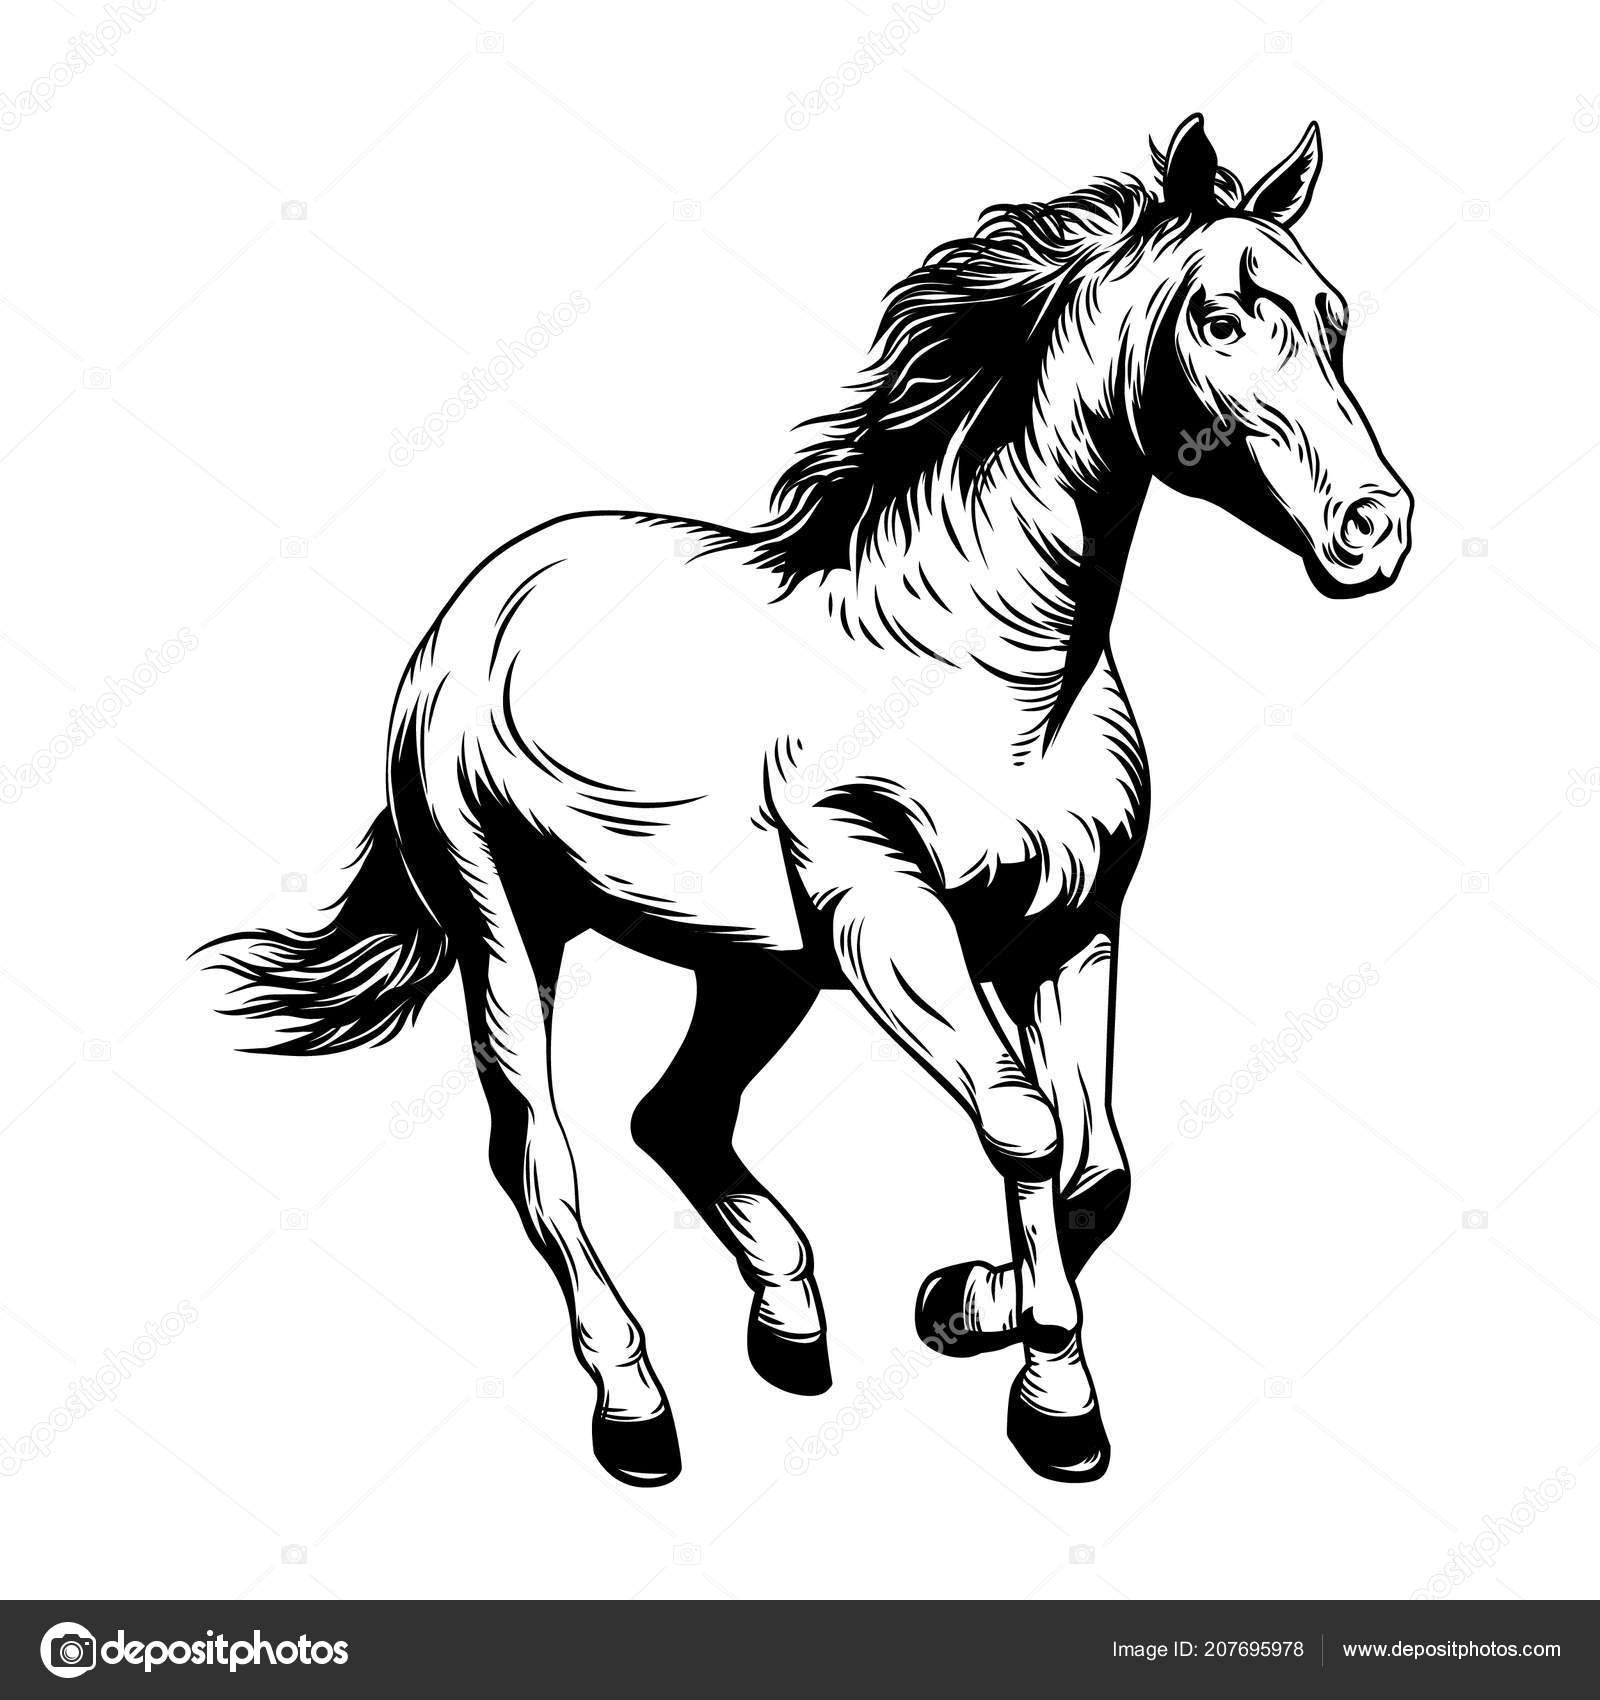 Horse Vector Illustration Horse Racing Drawing Stock Vector C Artandrew 207695978